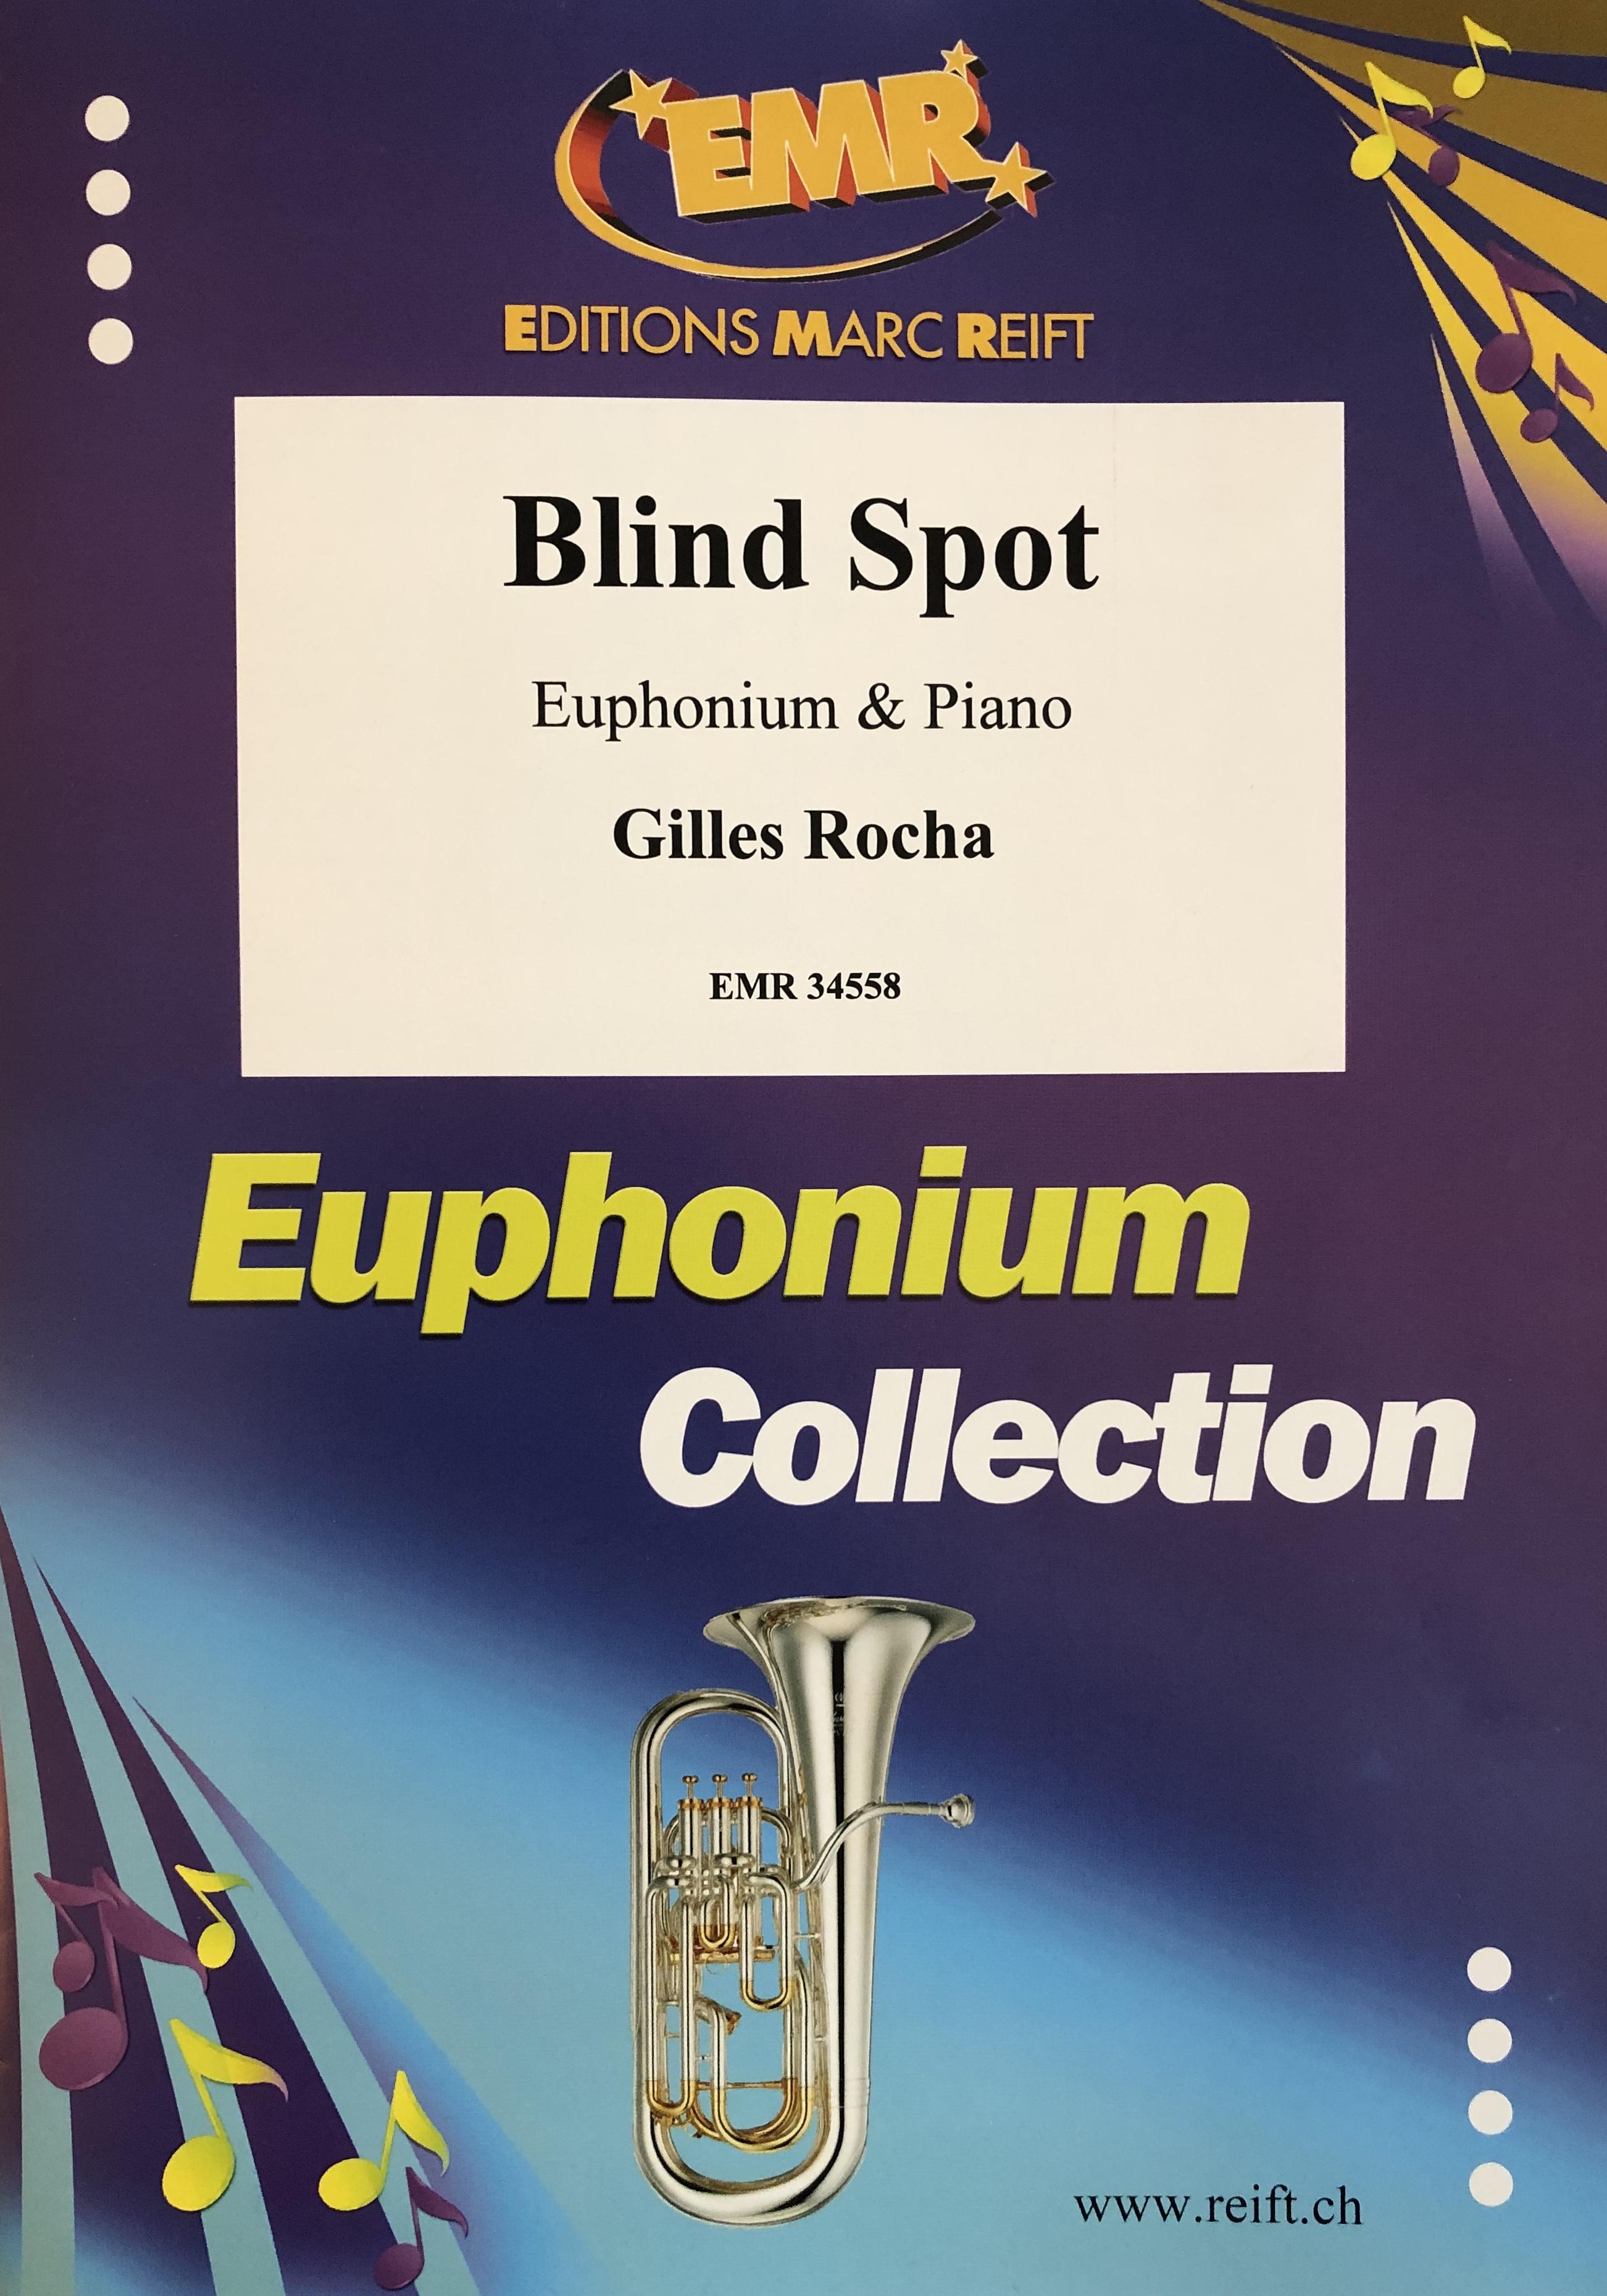 Blind Spot - Gilles Rocha - Euphonium and Piano